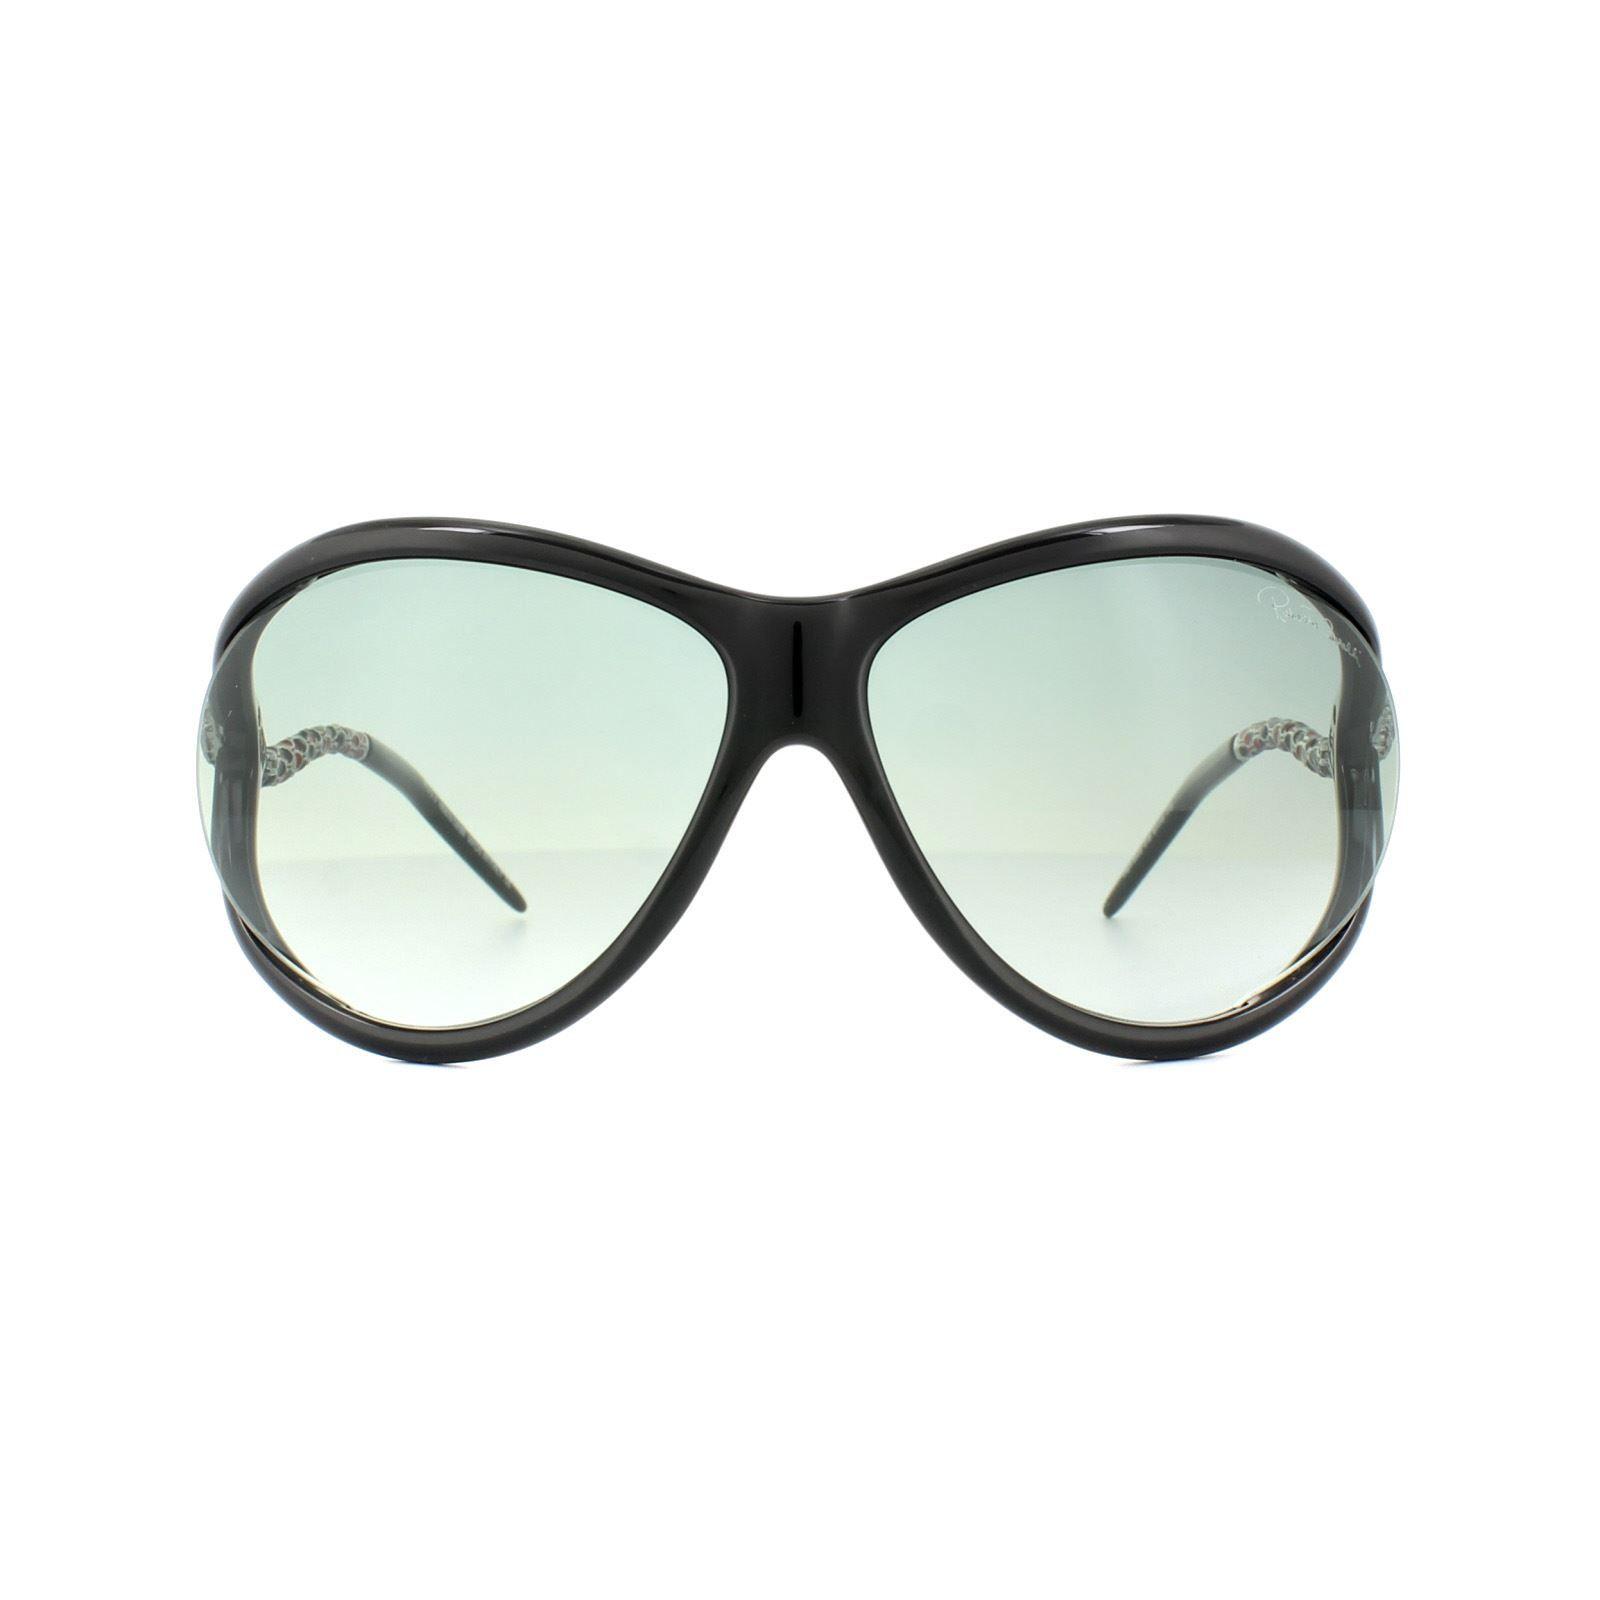 Roberto Cavalli Sunglasses Caph 853S 01B Shiny Black Grey Gradient